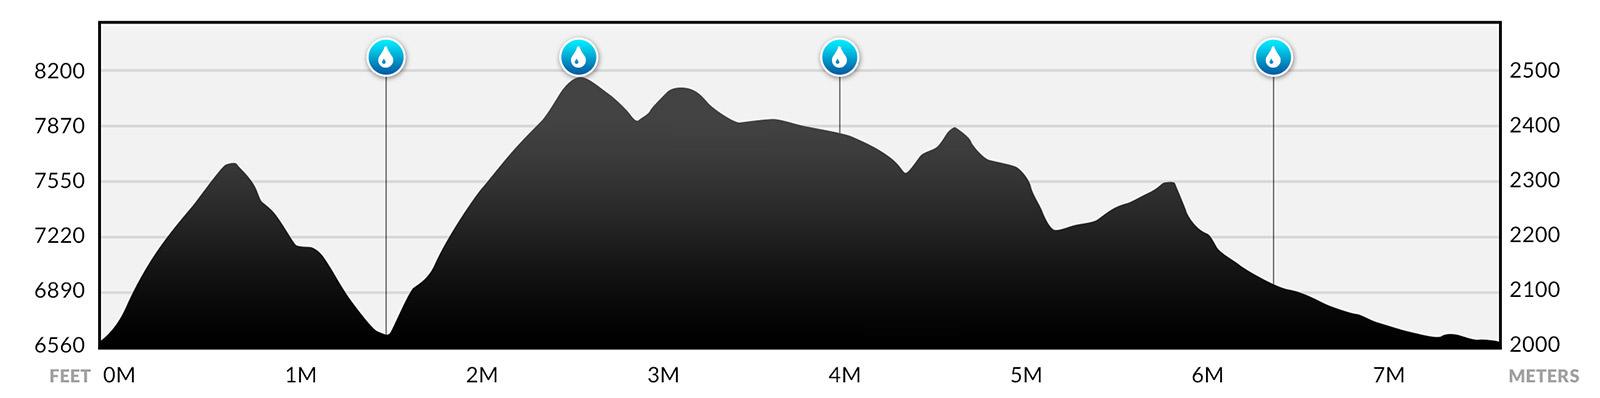 Mt. High Elevation Profile